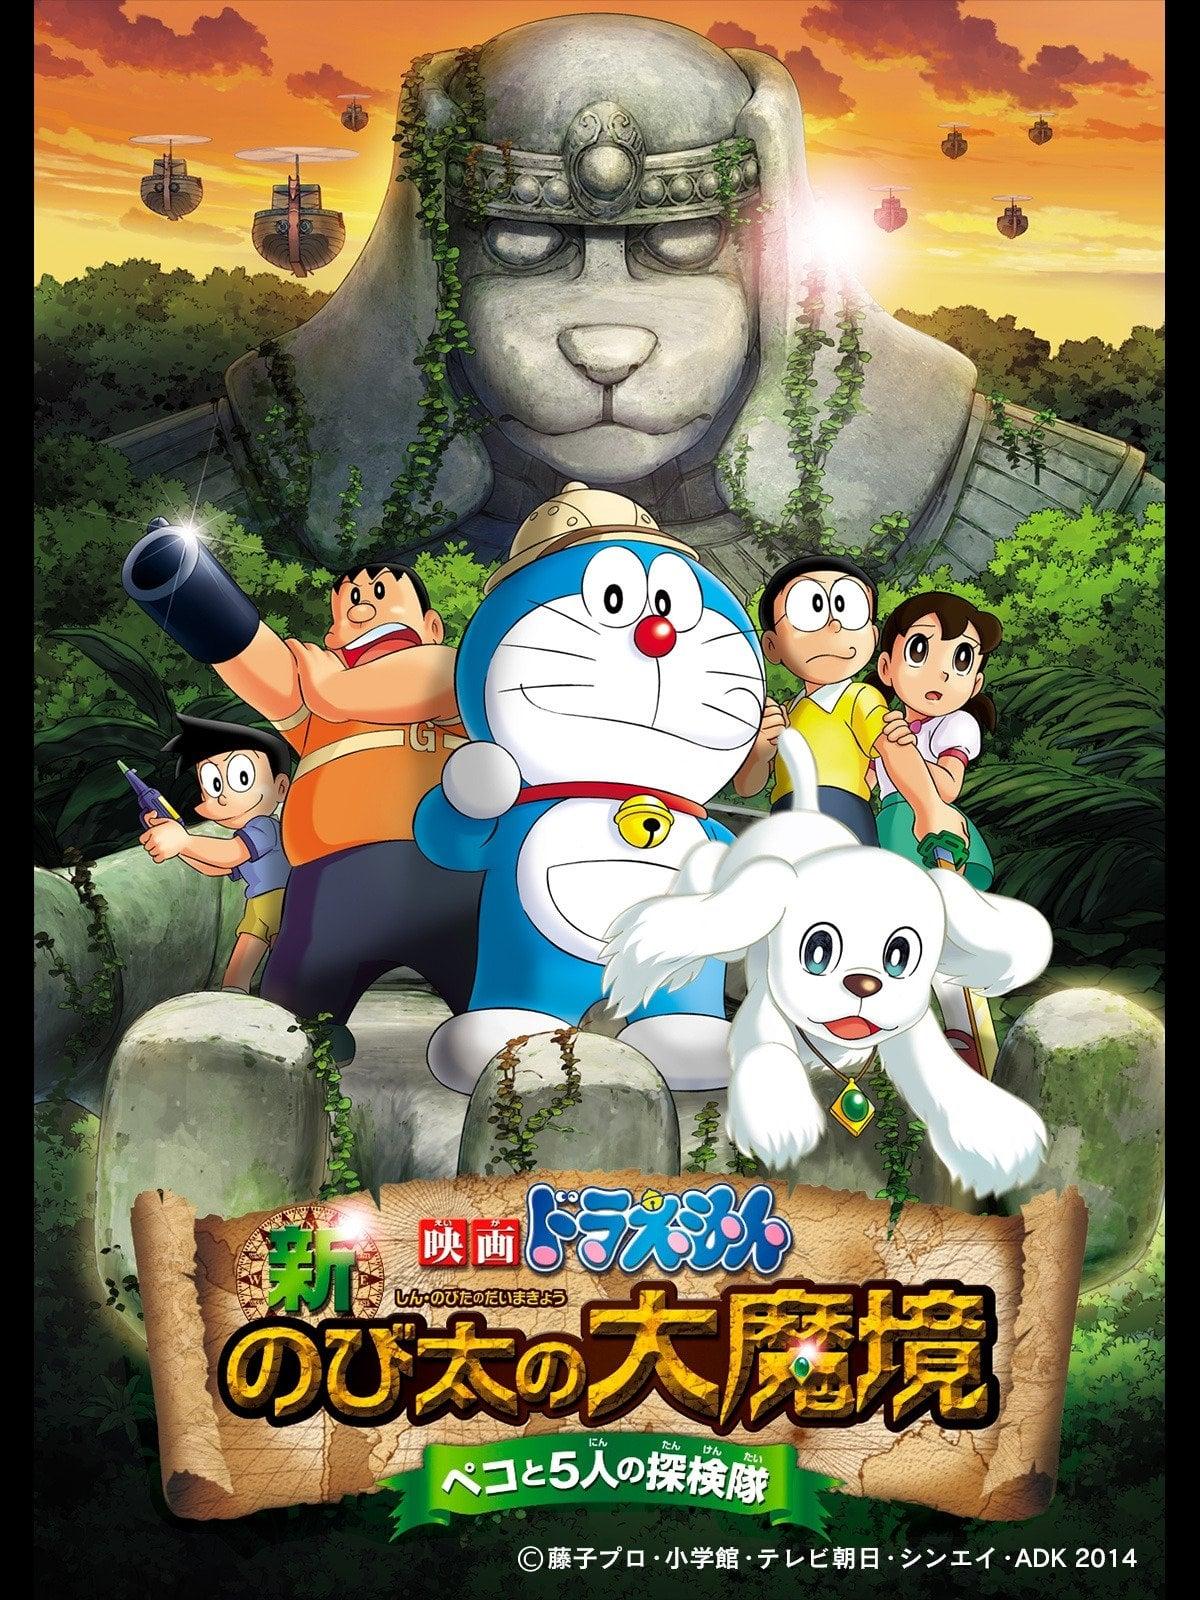 Doraemon: New Nobita's Great Demon - Peko and the Exploration Party of Five (2014)